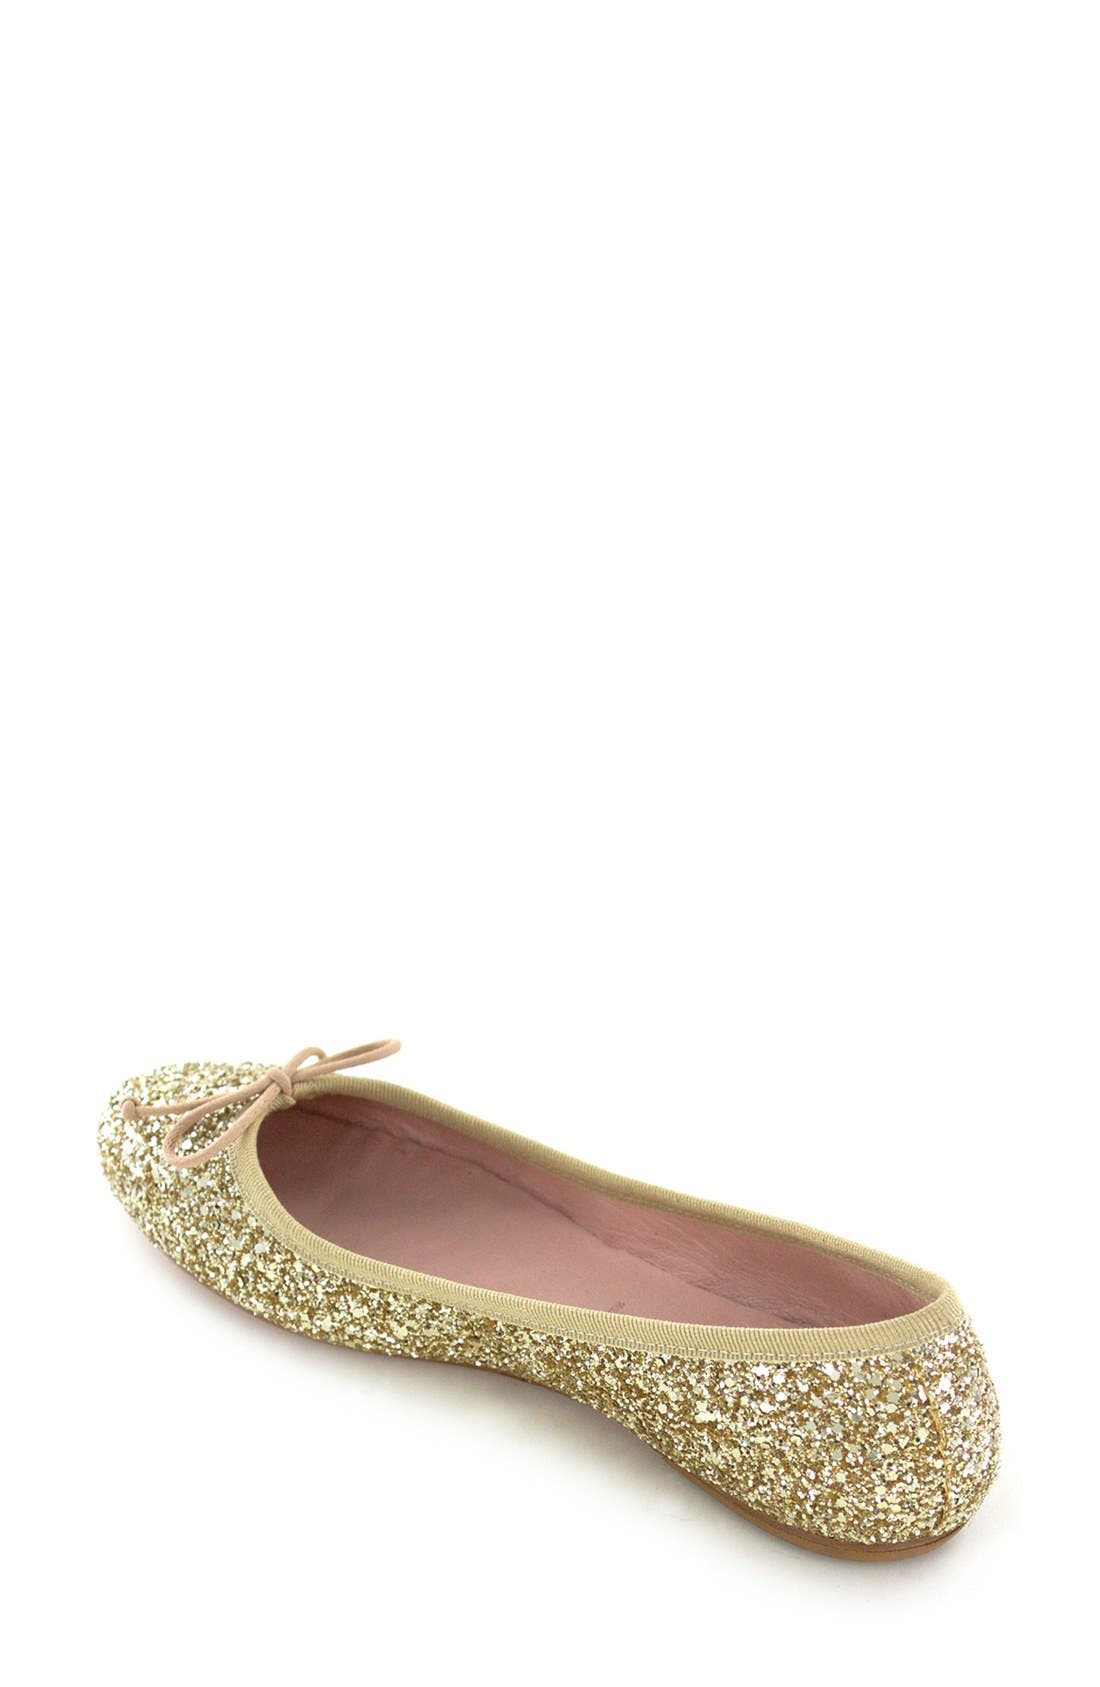 Summit 'Kendall' Ballet Flat,                             Alternate thumbnail 24, color,